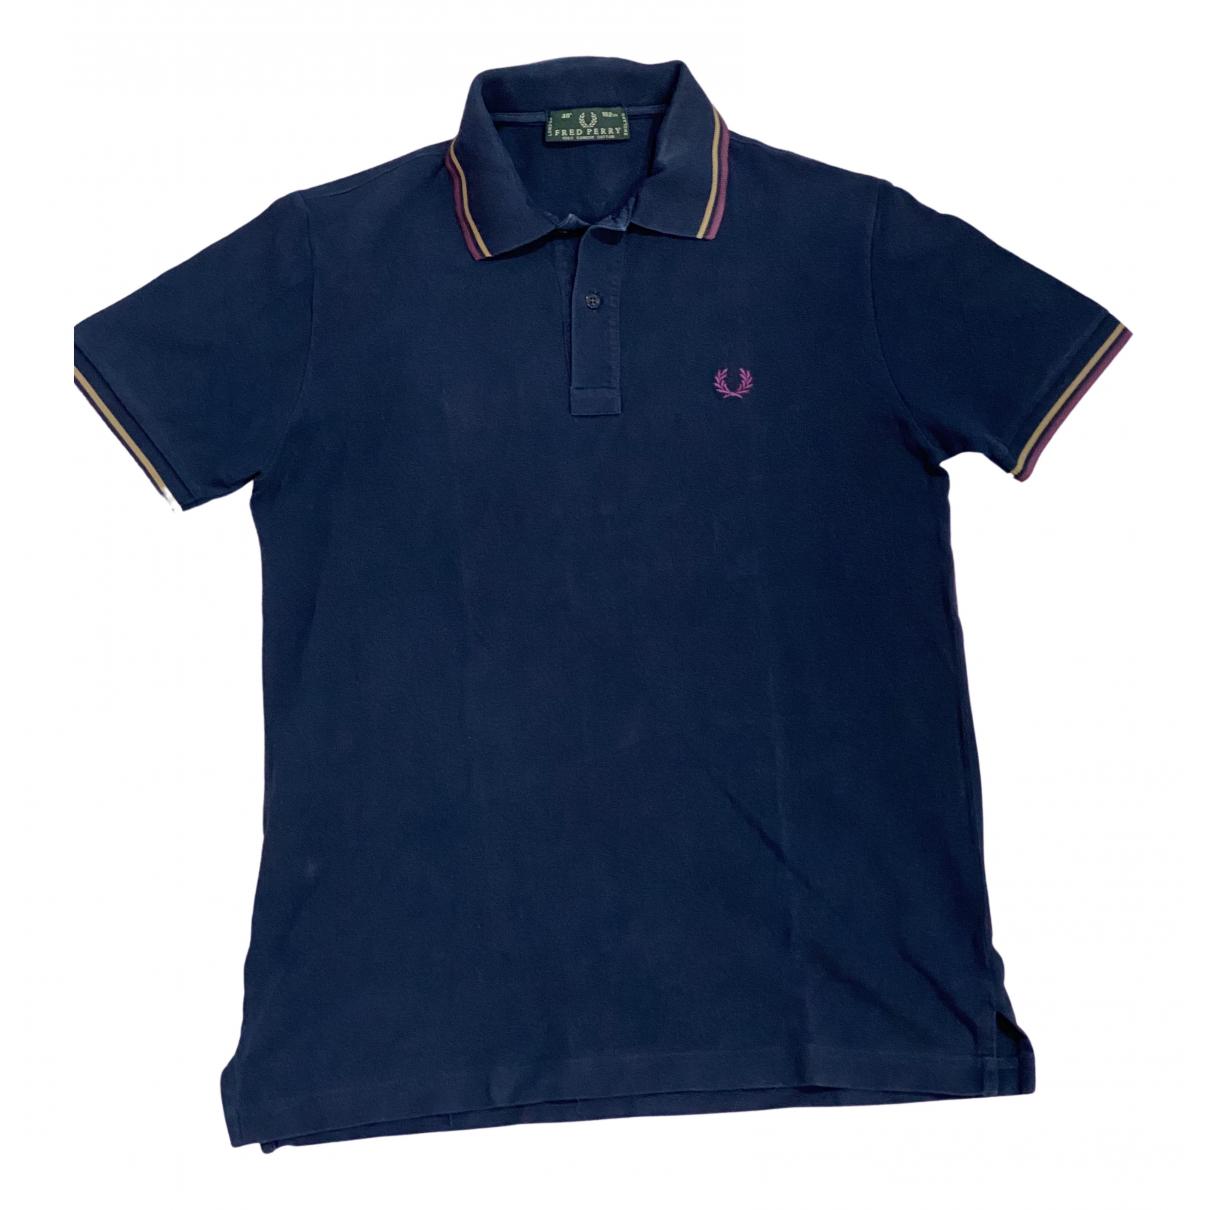 Fred Perry - Tee shirts   pour homme en coton - bleu